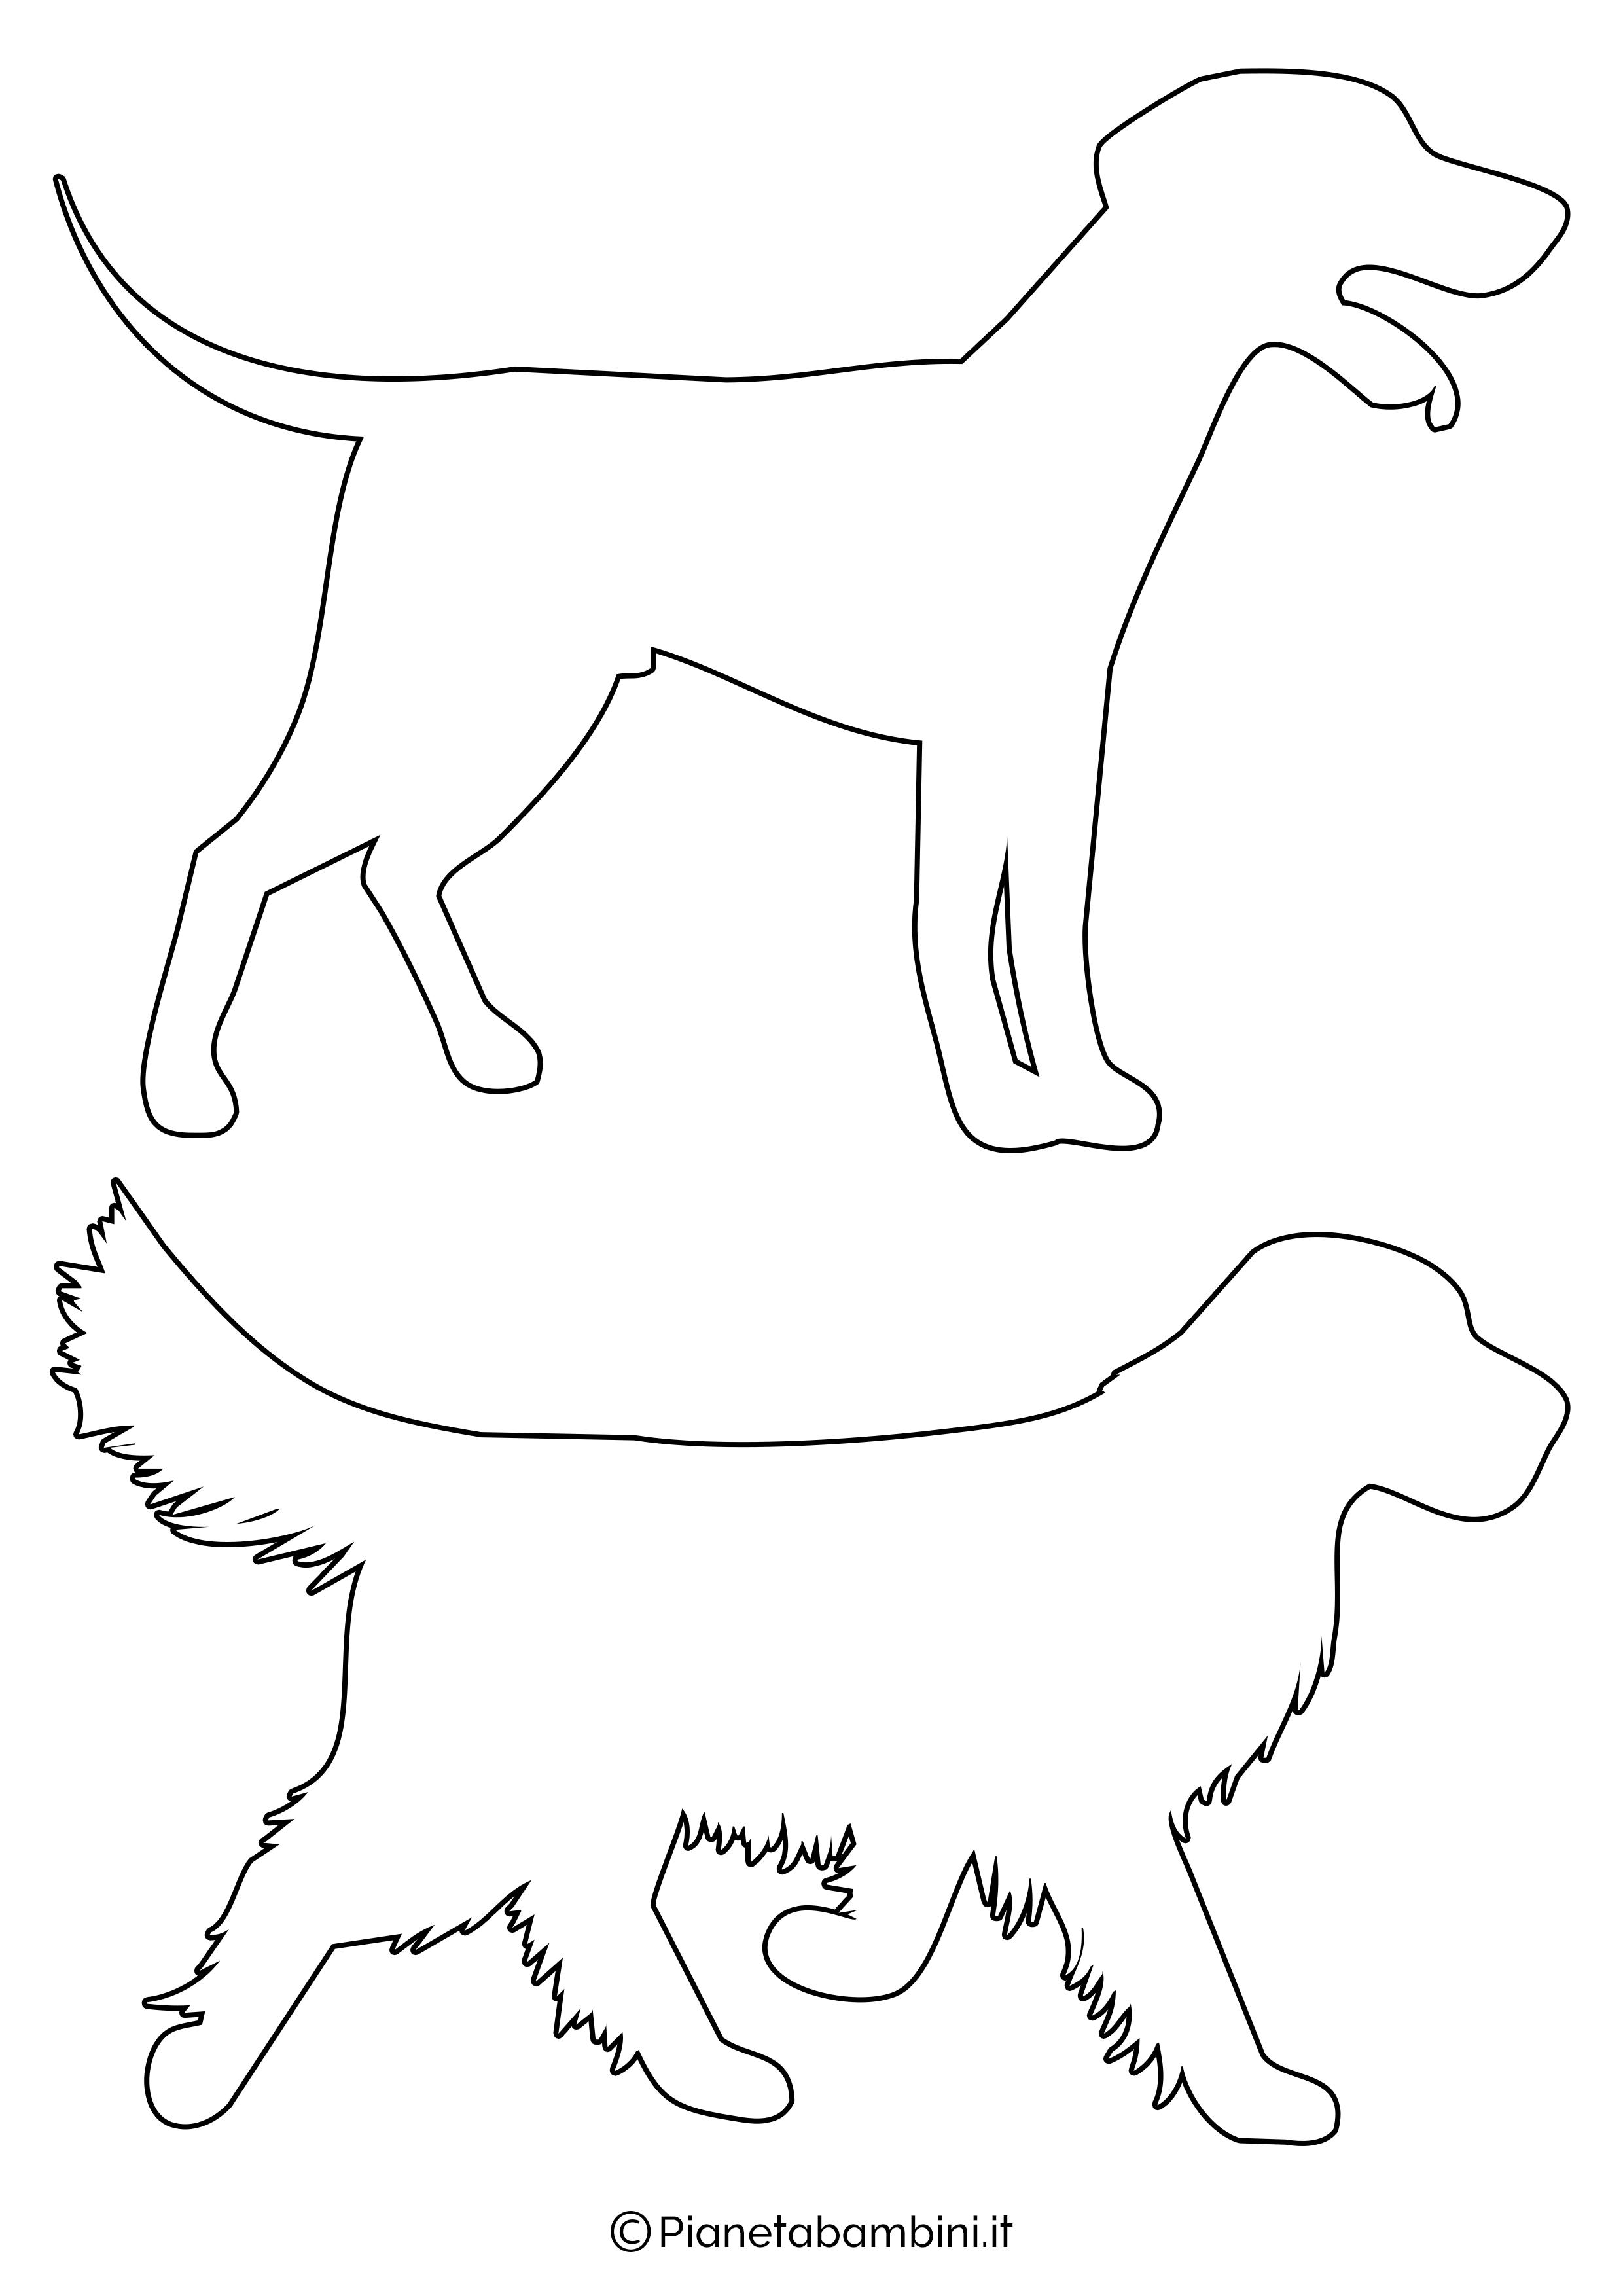 Sagome di cani medie da ritagliare 2